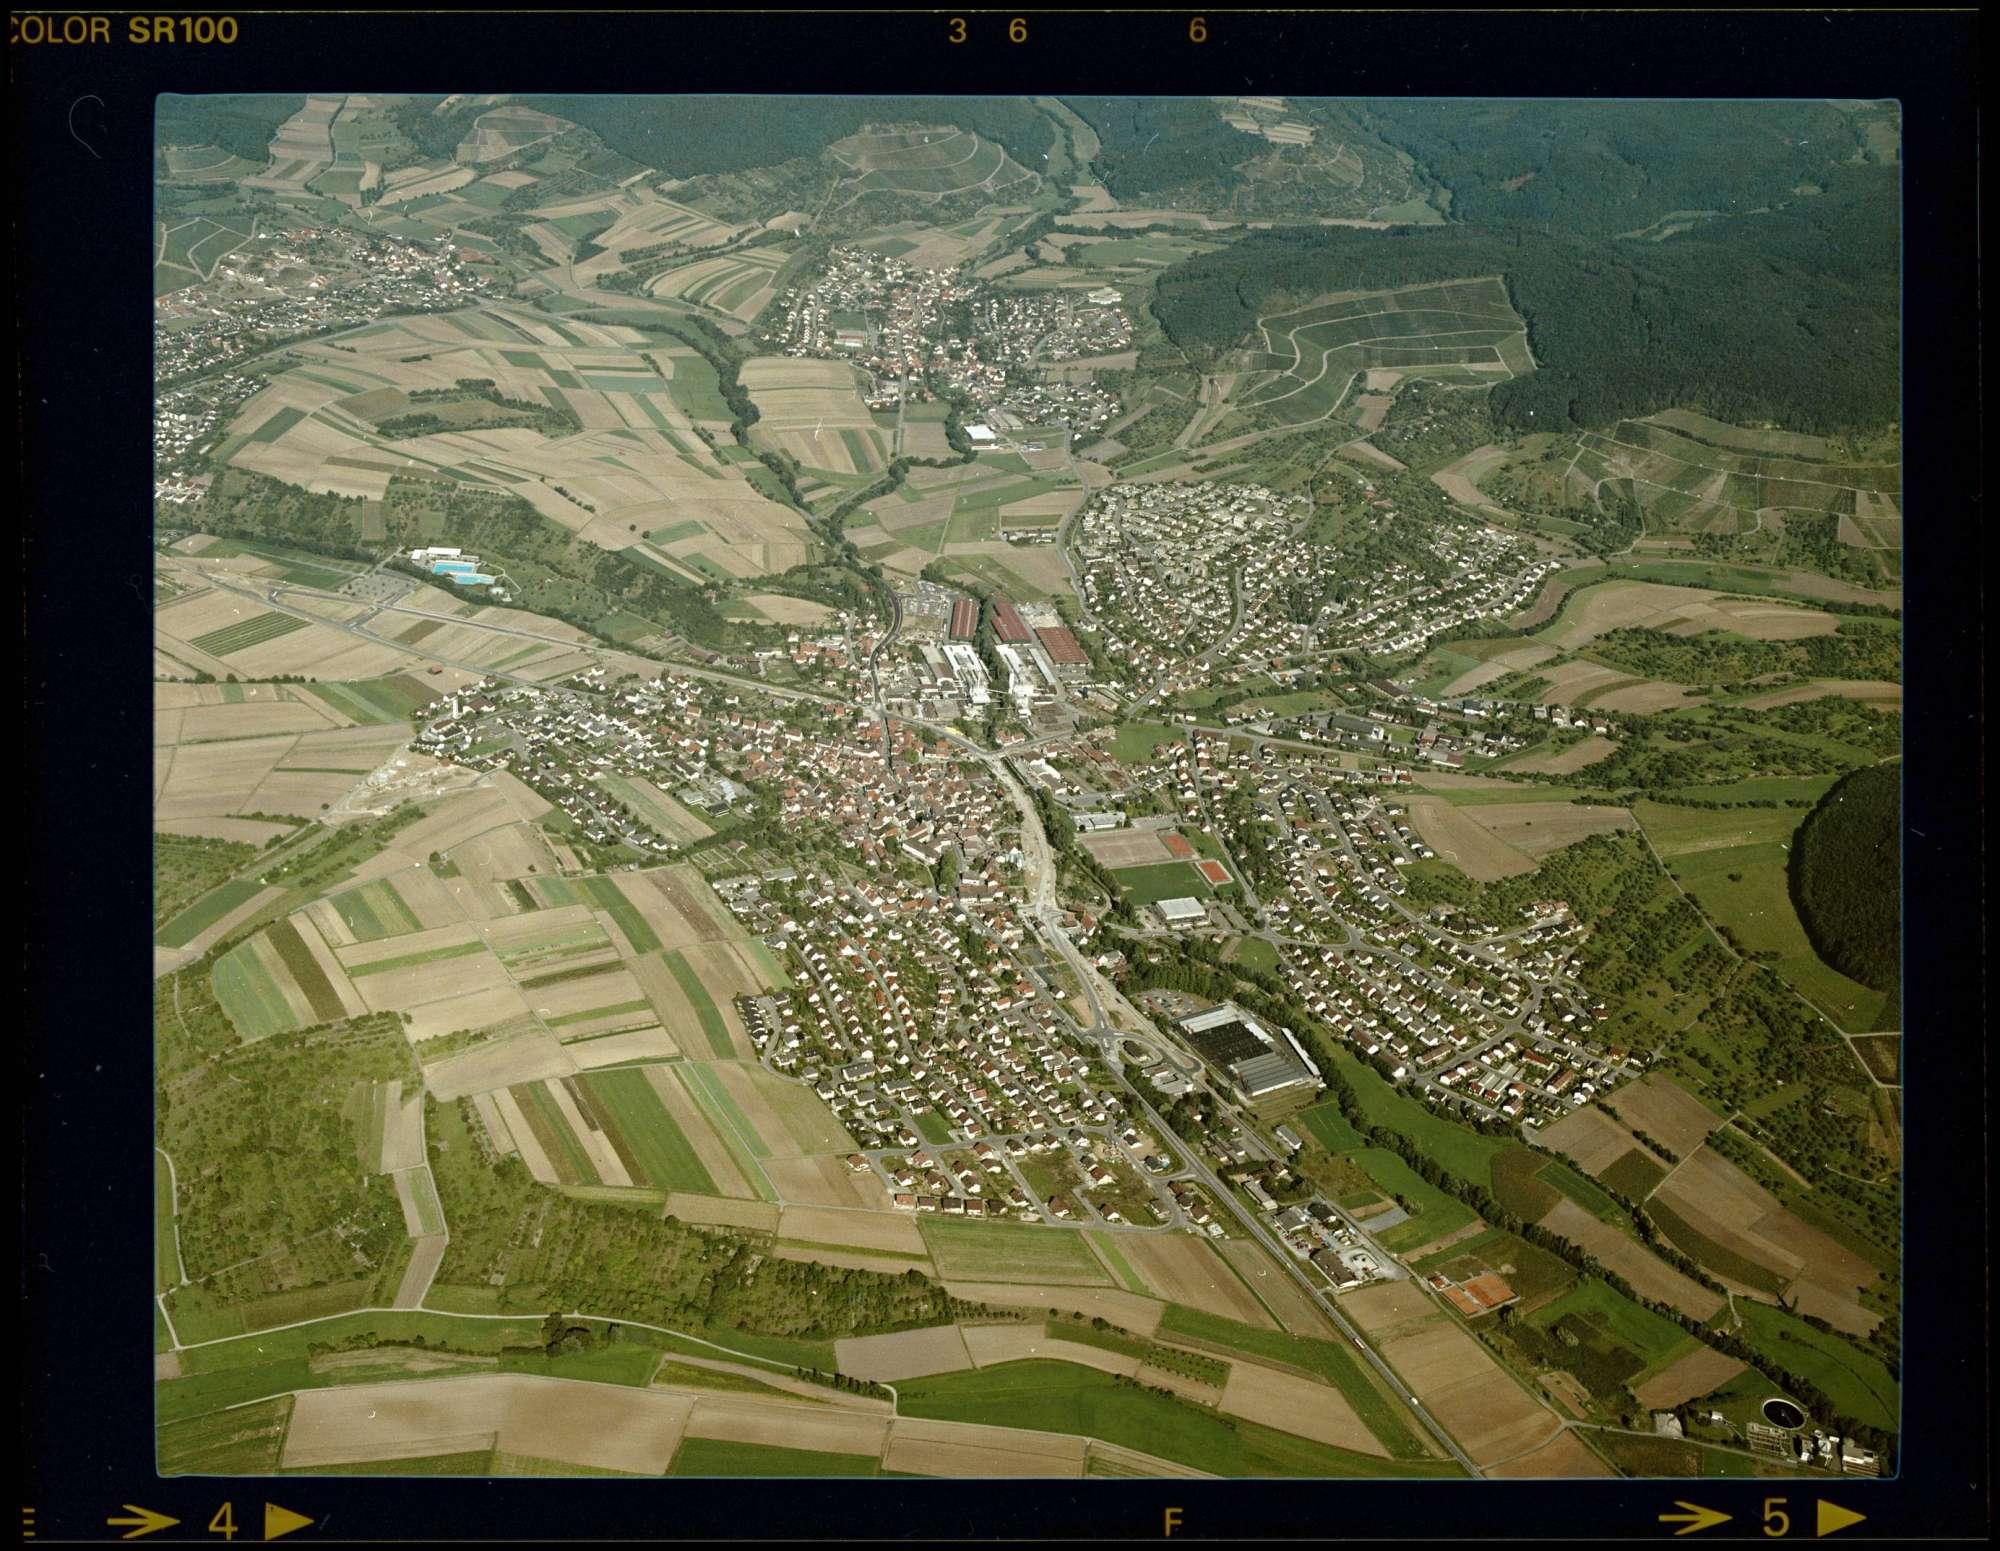 Oberstenfeld, Luftbild, Bild 1